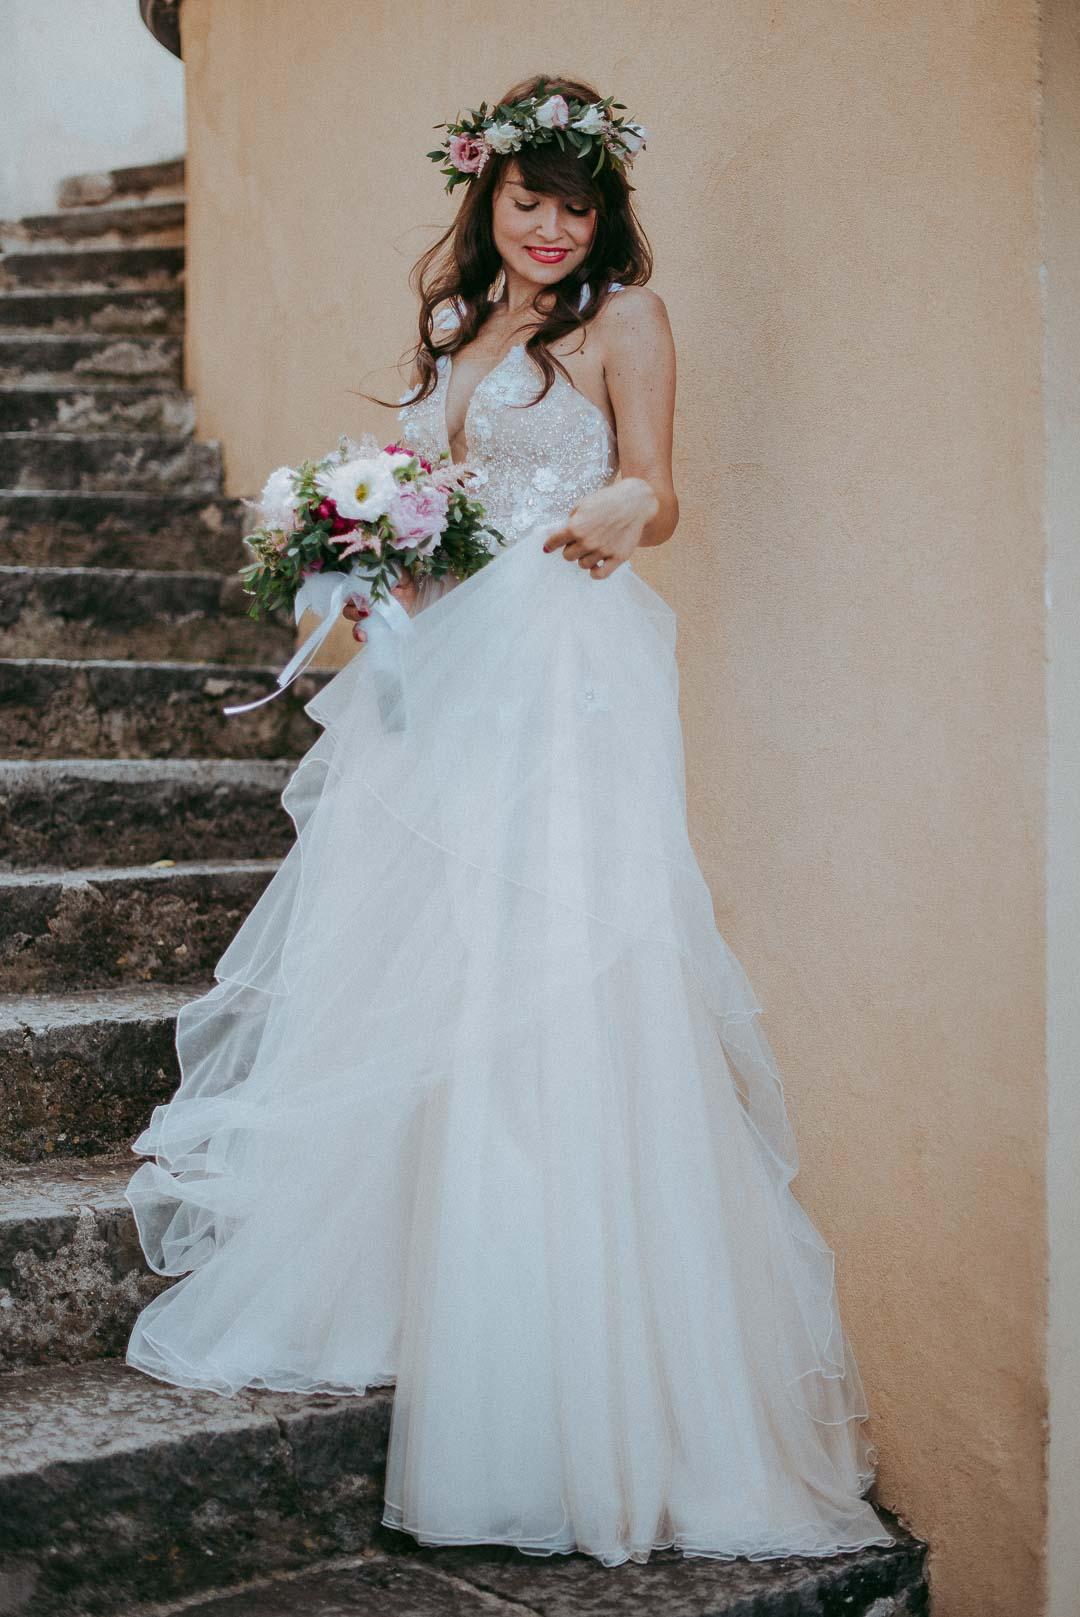 wedding-photographer-destination-fineart-bespoke-reportage-amalficoast-torrelacerniola-vivianeizzo-spazio46-51